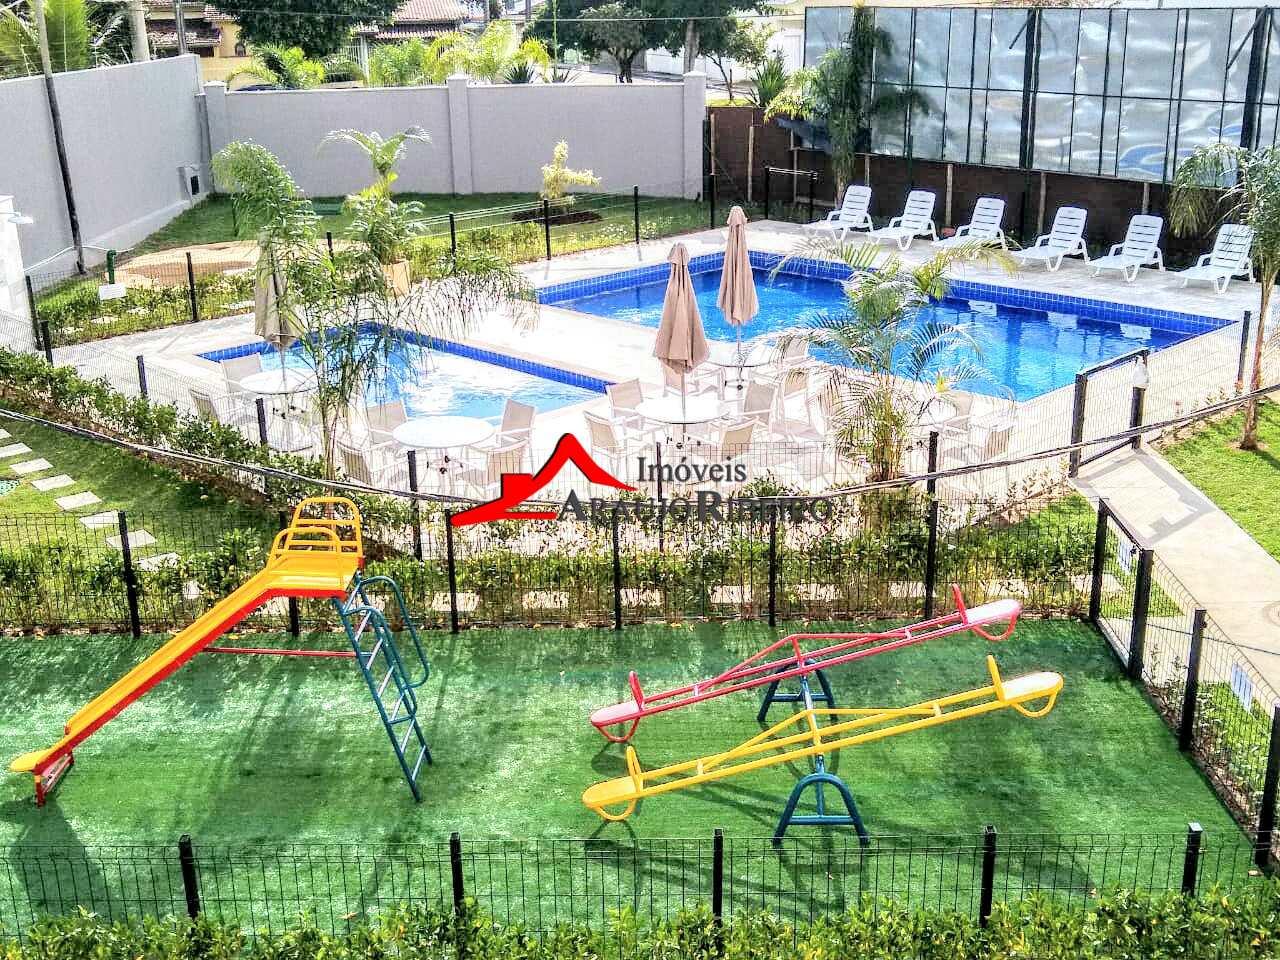 Apartamento com 2 dorms, Jardim Jaraguá, Taubaté - R$ 156 mil, Cod: 3193